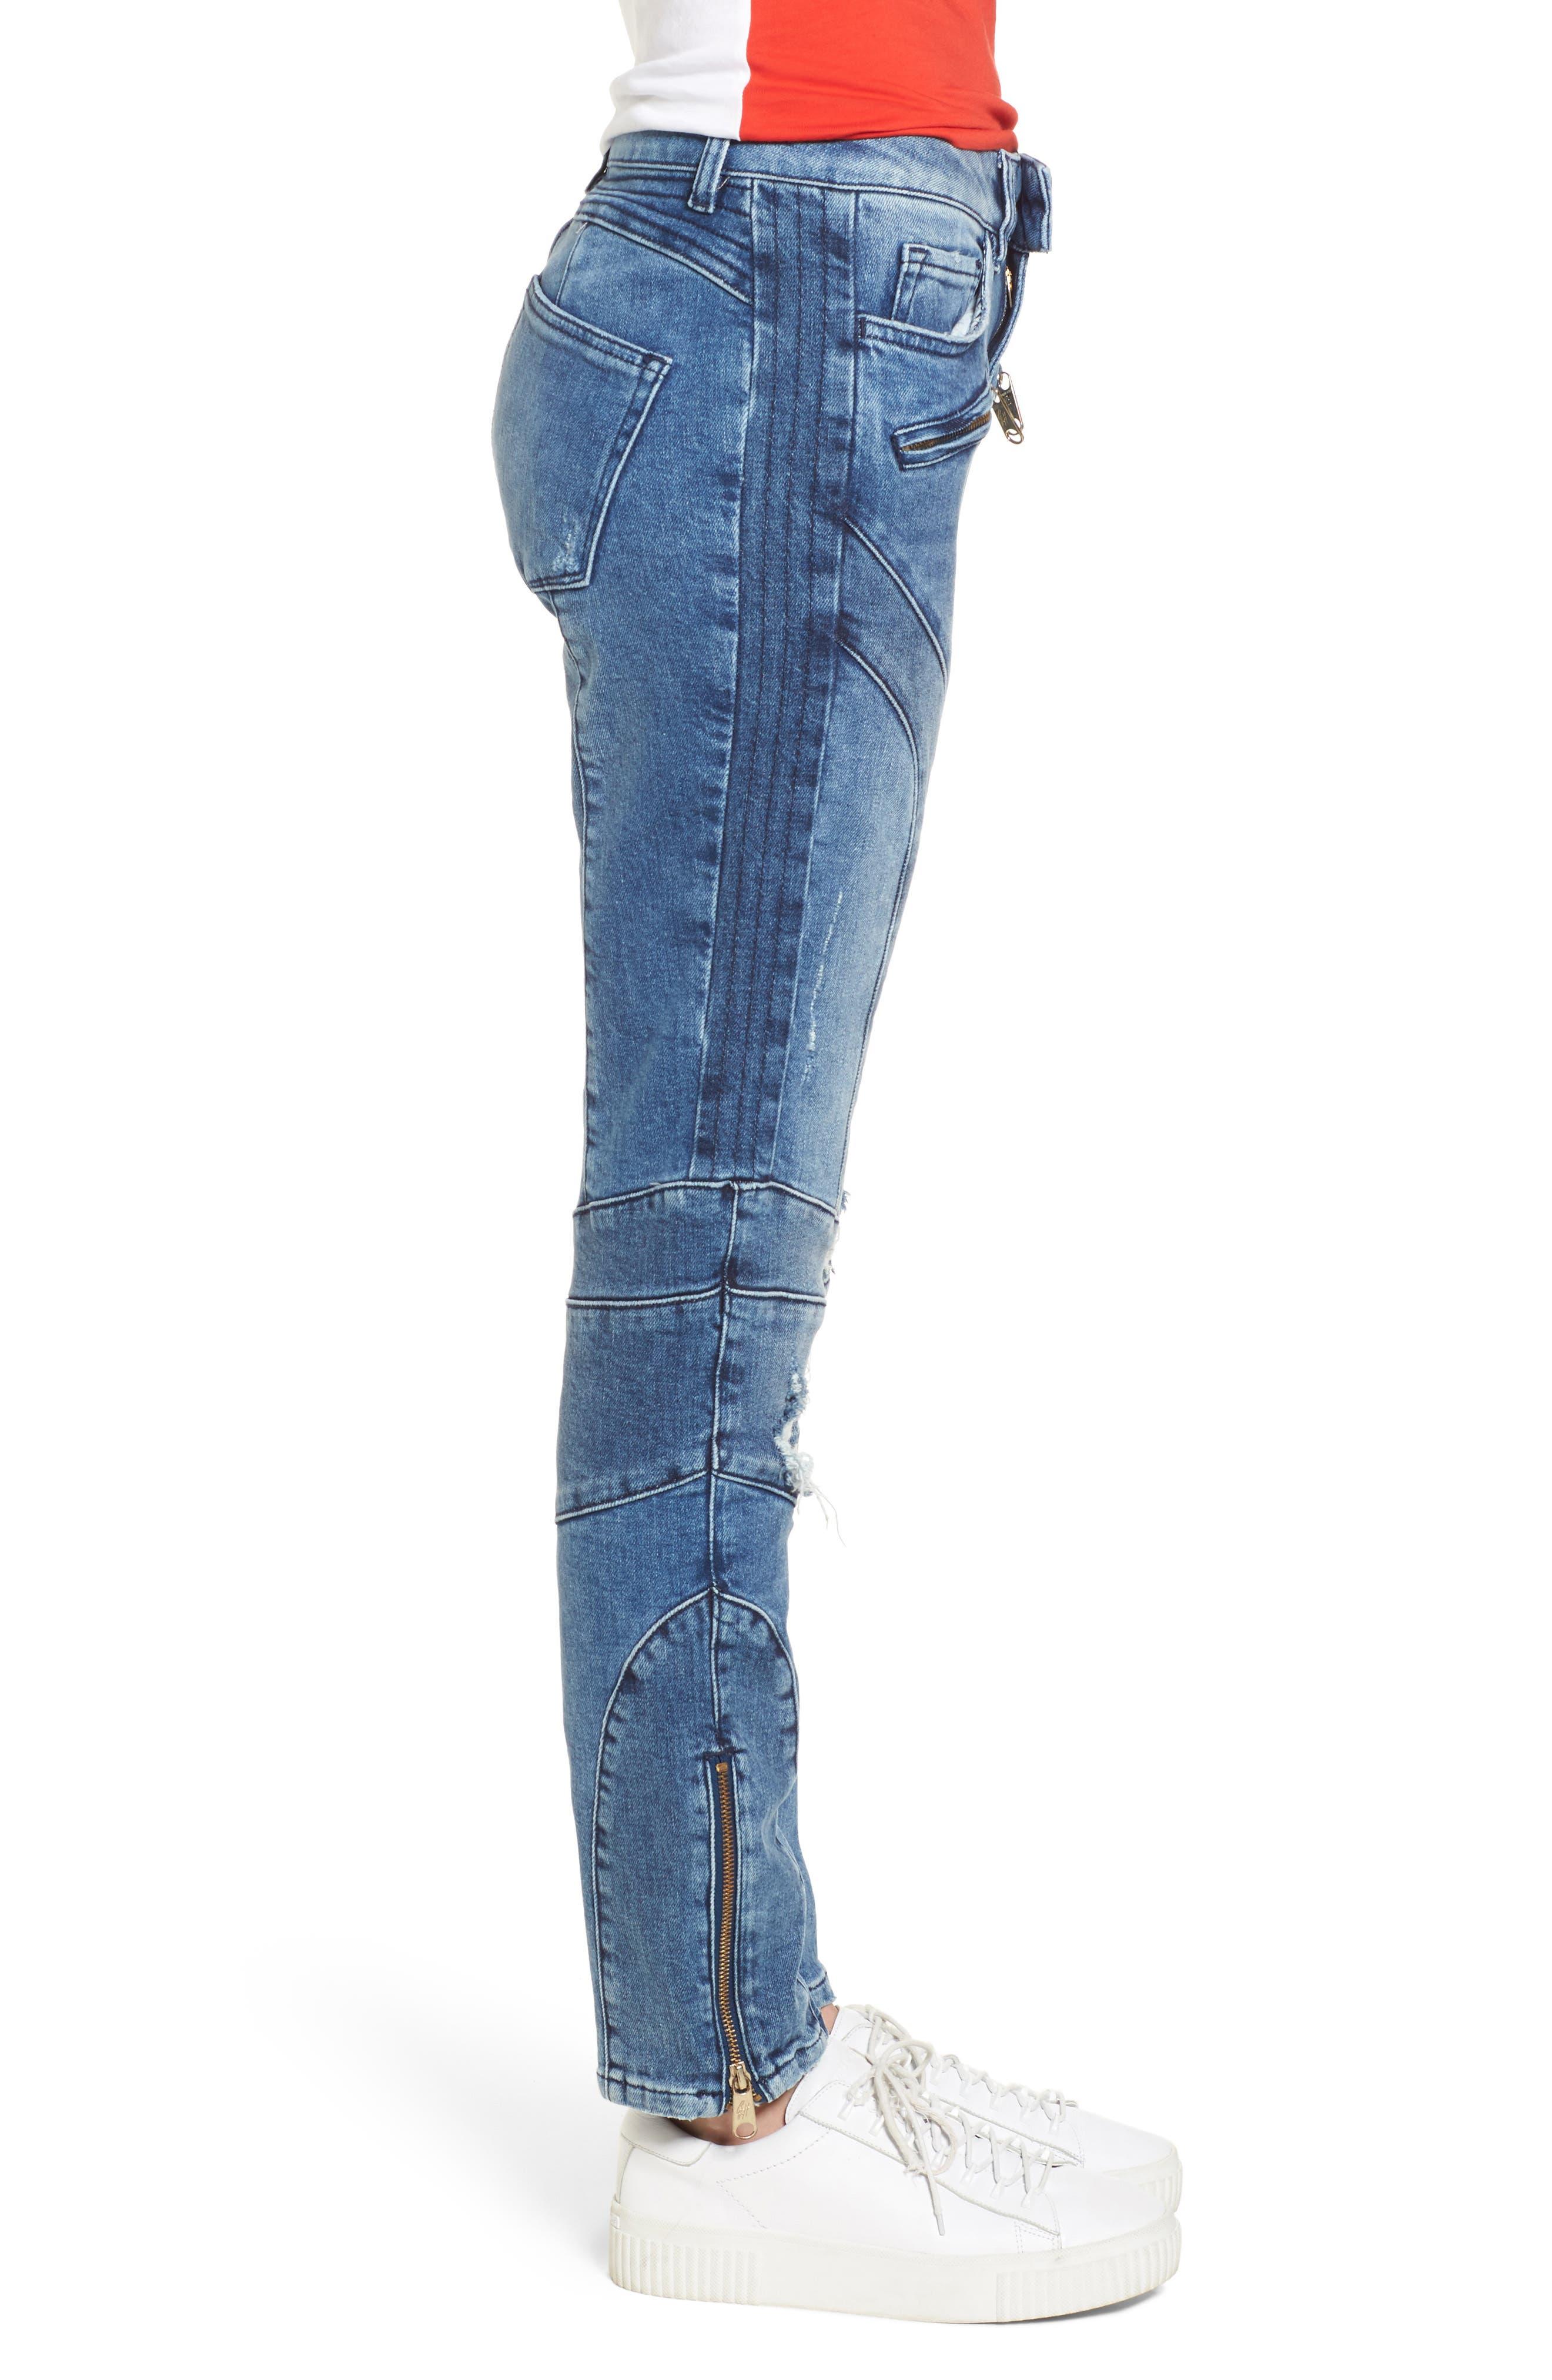 x Gigi Hadid Speed Distressed Ankle Zip Jeans,                             Alternate thumbnail 3, color,                             400